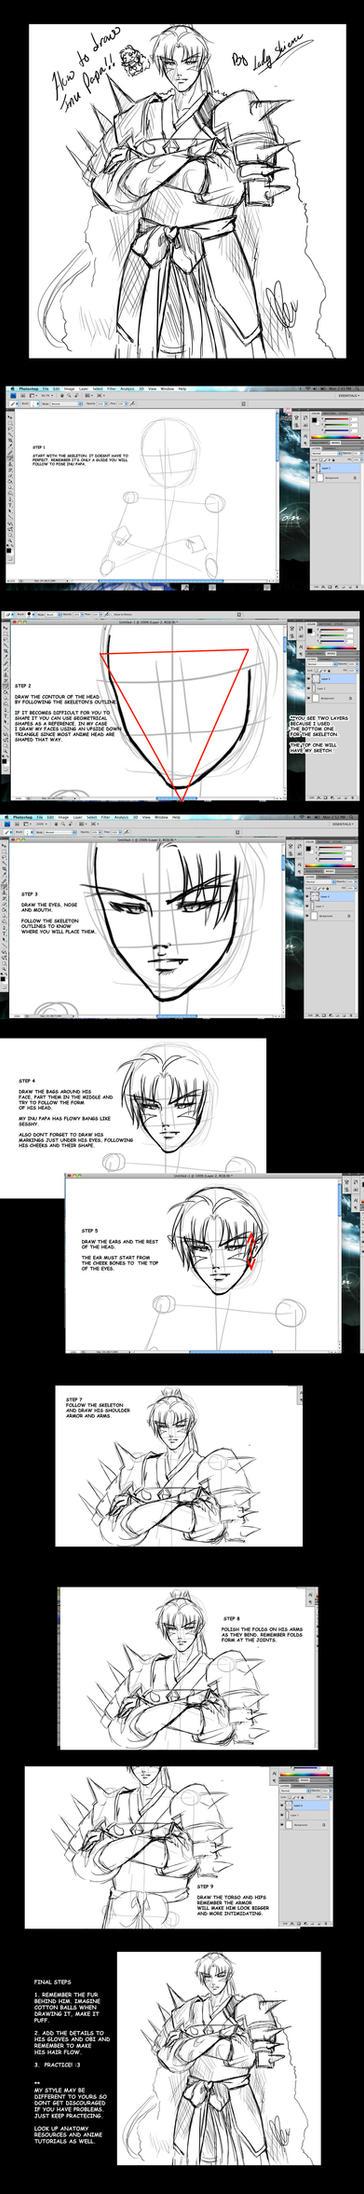 How to draw Inu no Taisho tutorial by Nardhwen